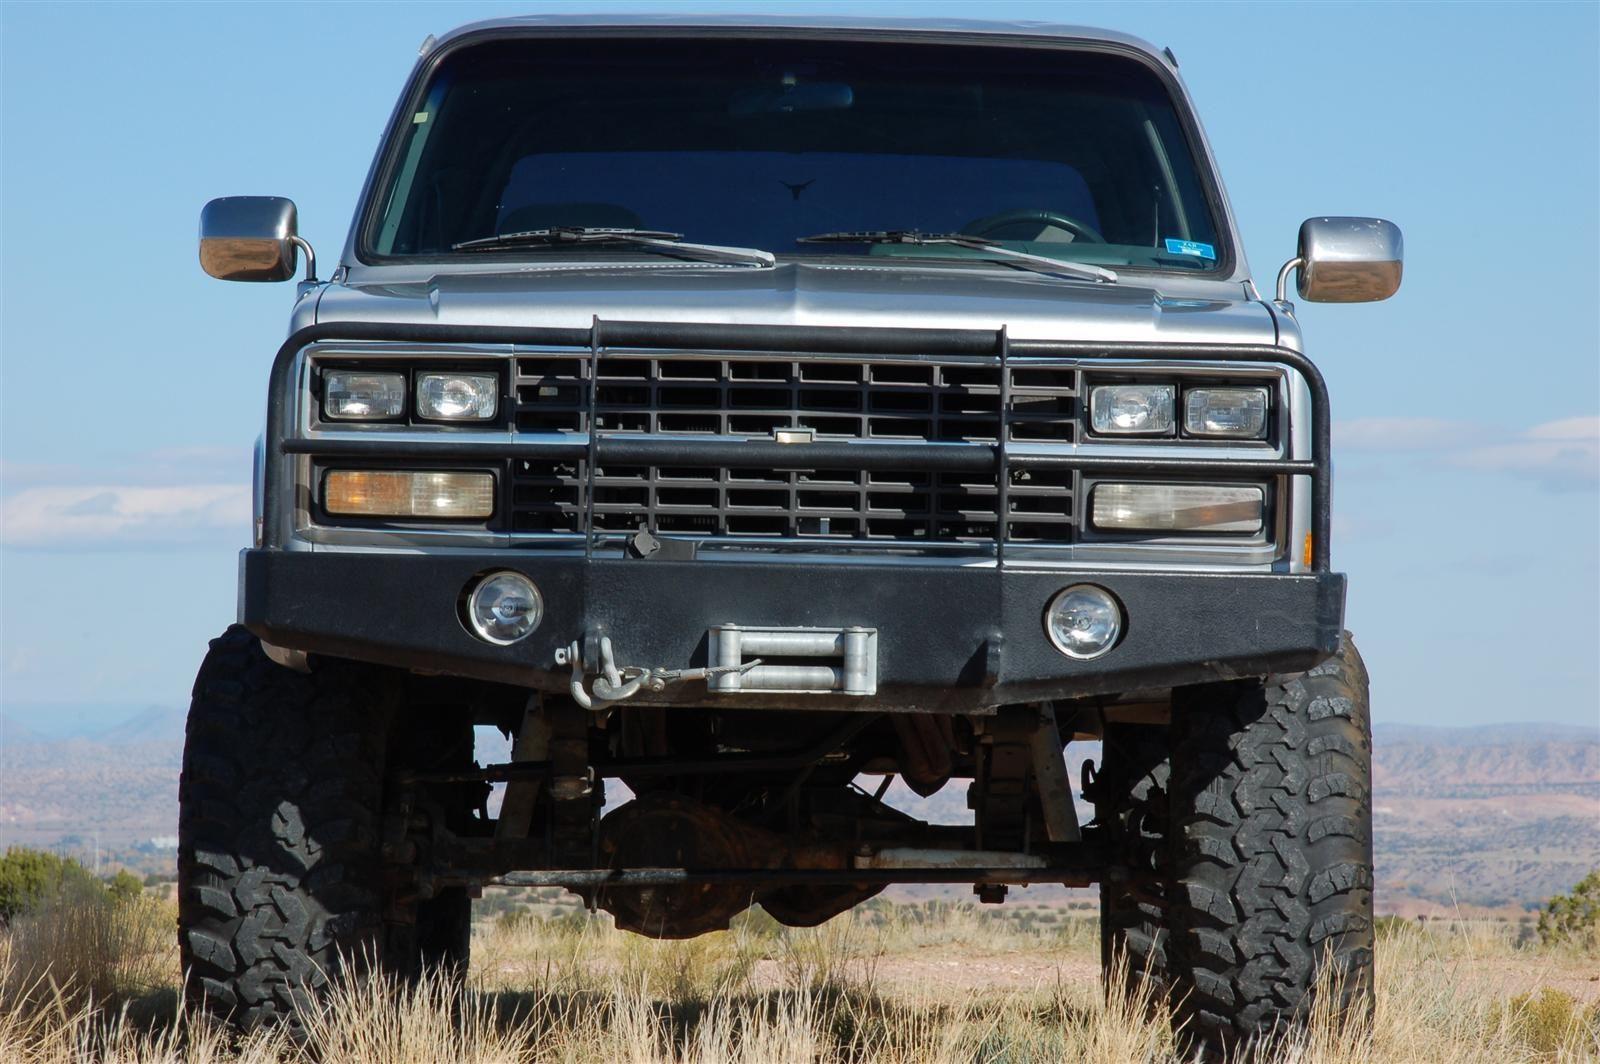 86 Gmc Jimmy Gmc Trucks Gmc Square Body